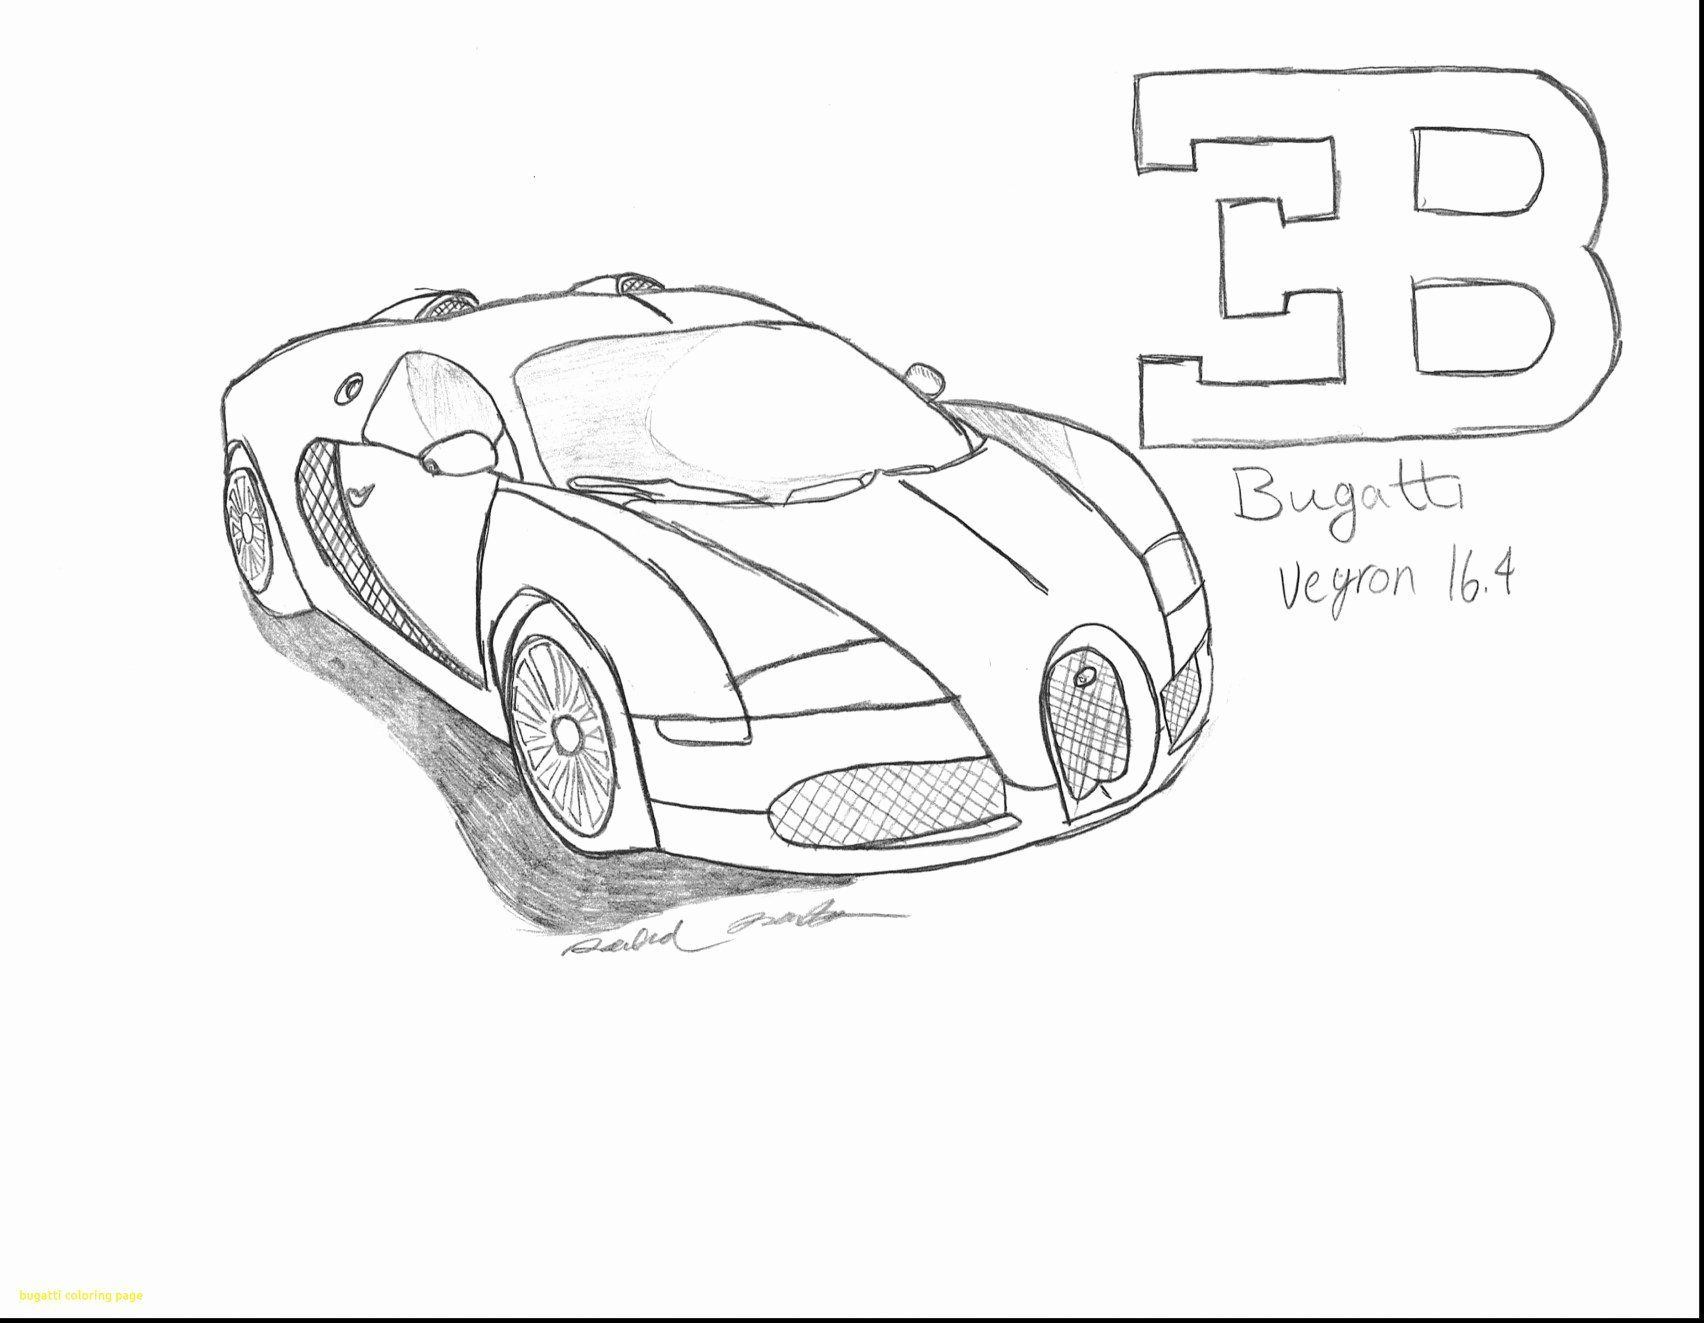 Transport Coloring Sheets Inspirational 85 Bugatti Coloring Pages Sports Coloring Pages Cars Coloring Pages Coloring Pages Inspirational